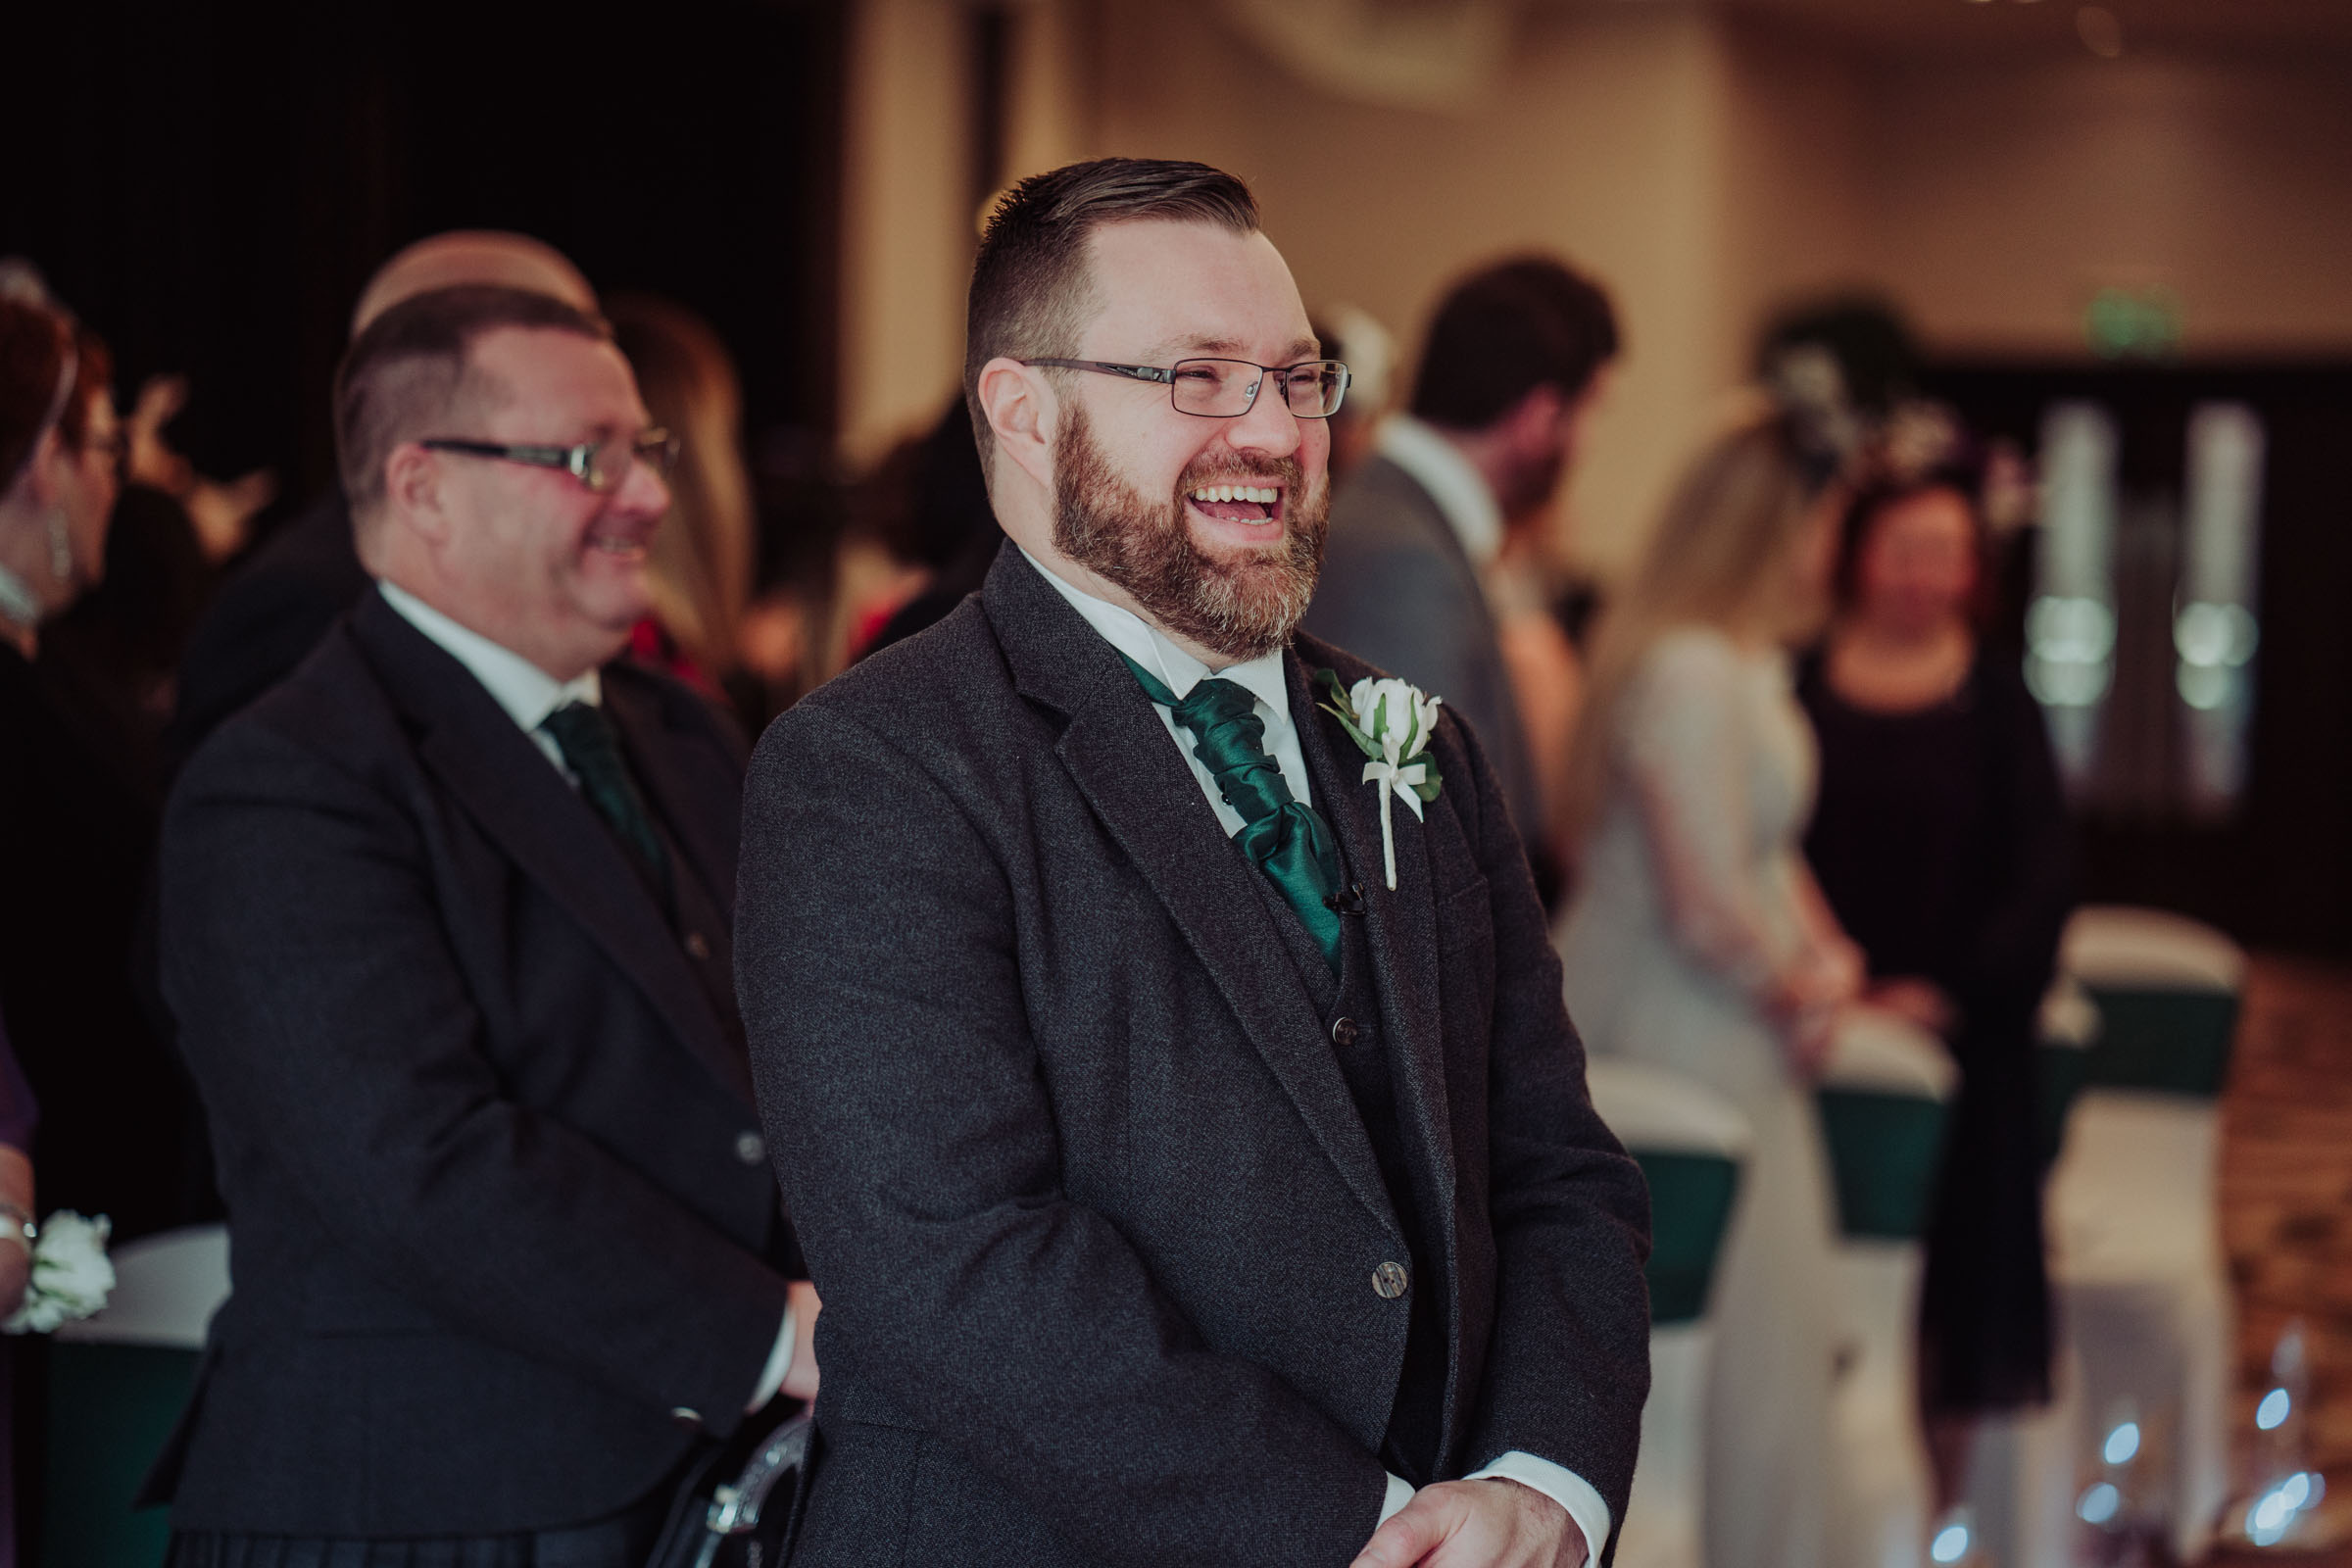 Radstone-Wedding-Dearly-Photography-Scotland (9 of 50).jpg